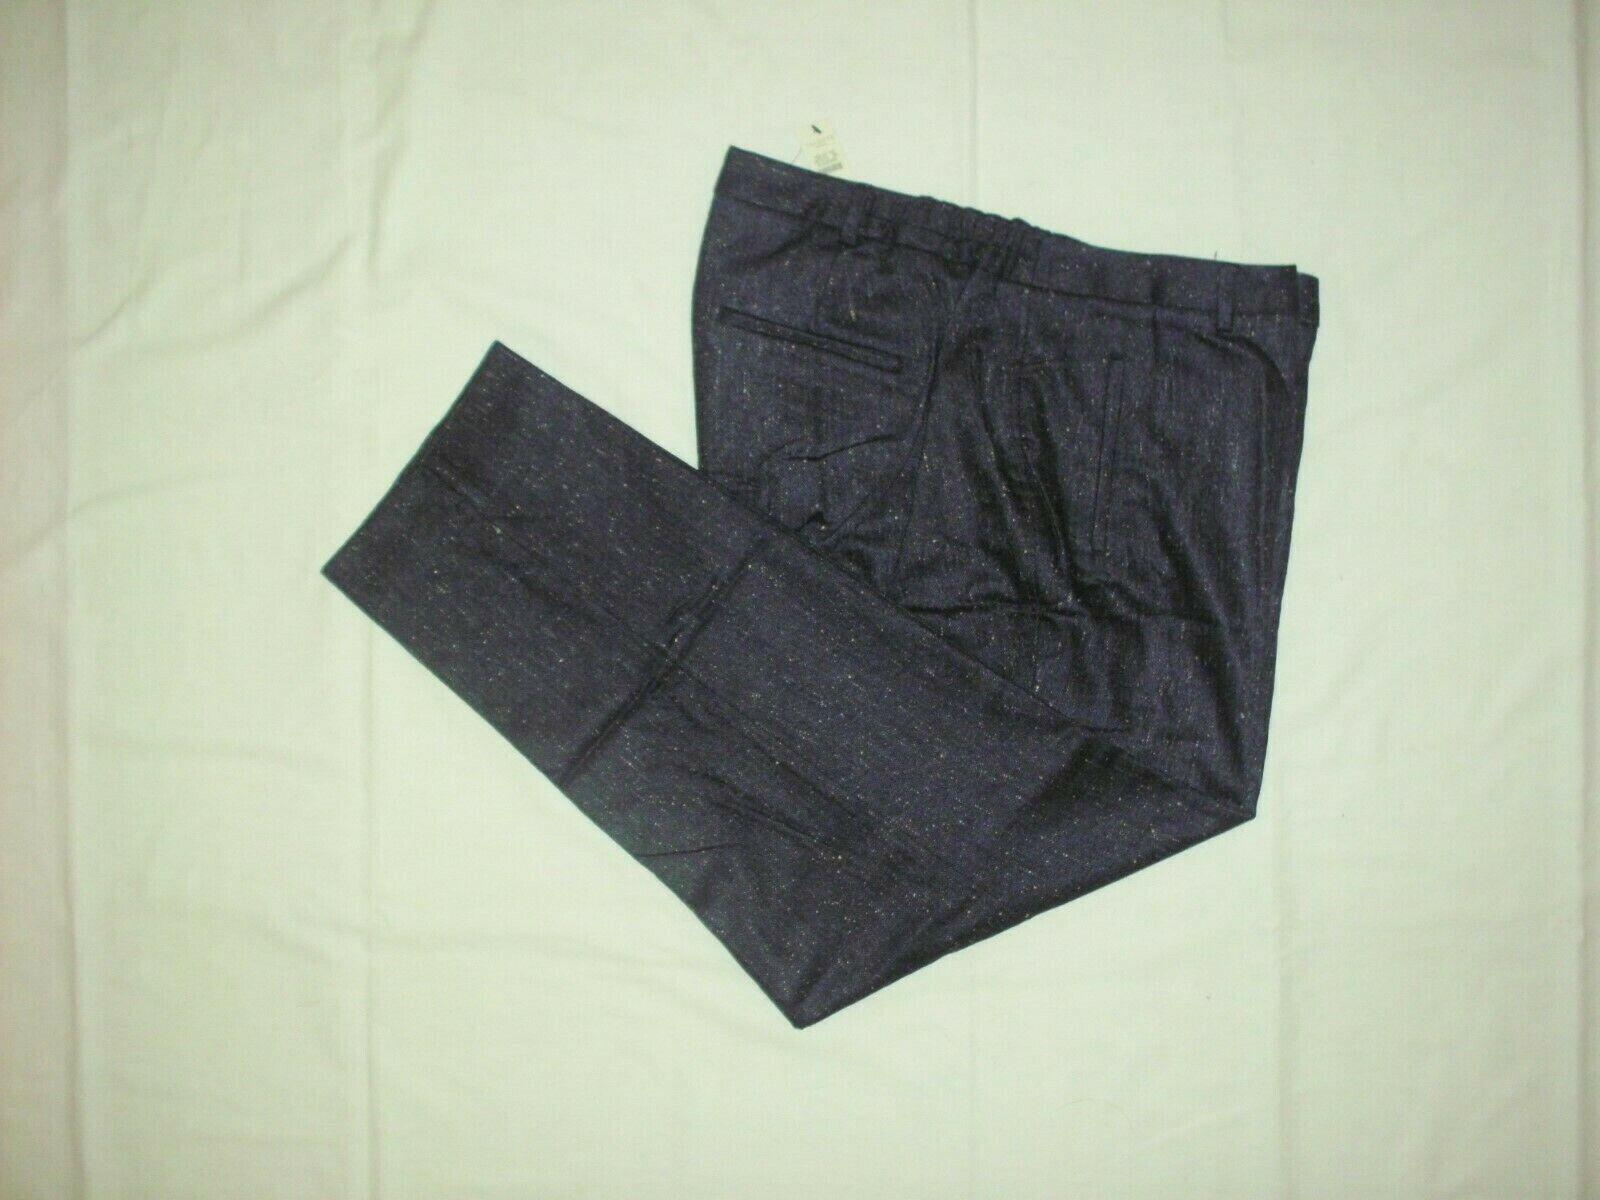 NEW  149 TALBOTS Hampshire Indigo Blau Italian Donegal Tweed Ankle Pants Sz 16W